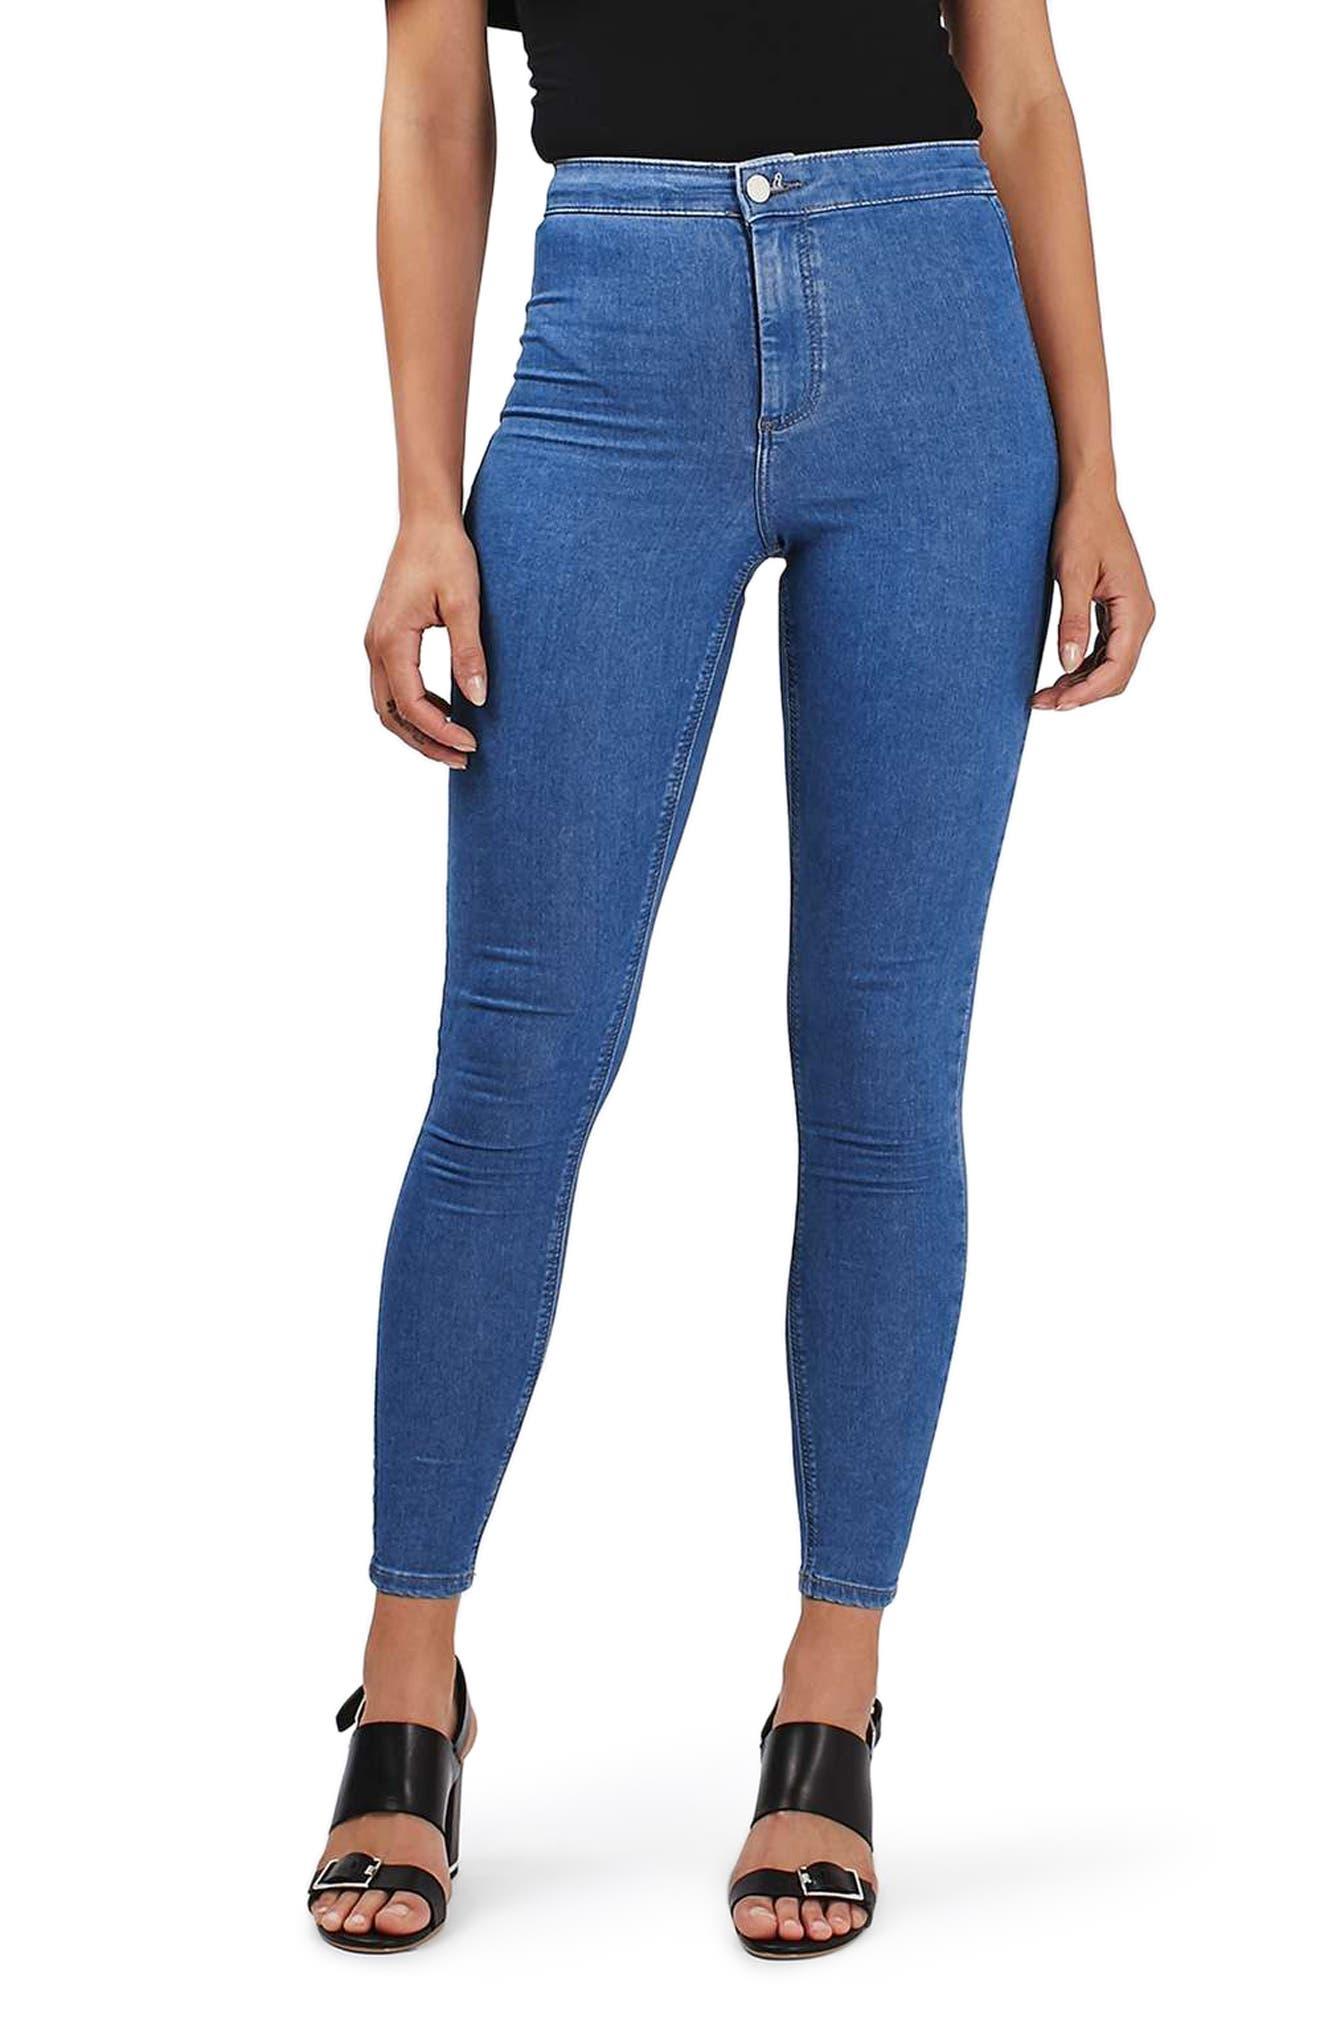 Alternate Image 1 Selected - Topshop Joni Skinny Jeans (Tall)